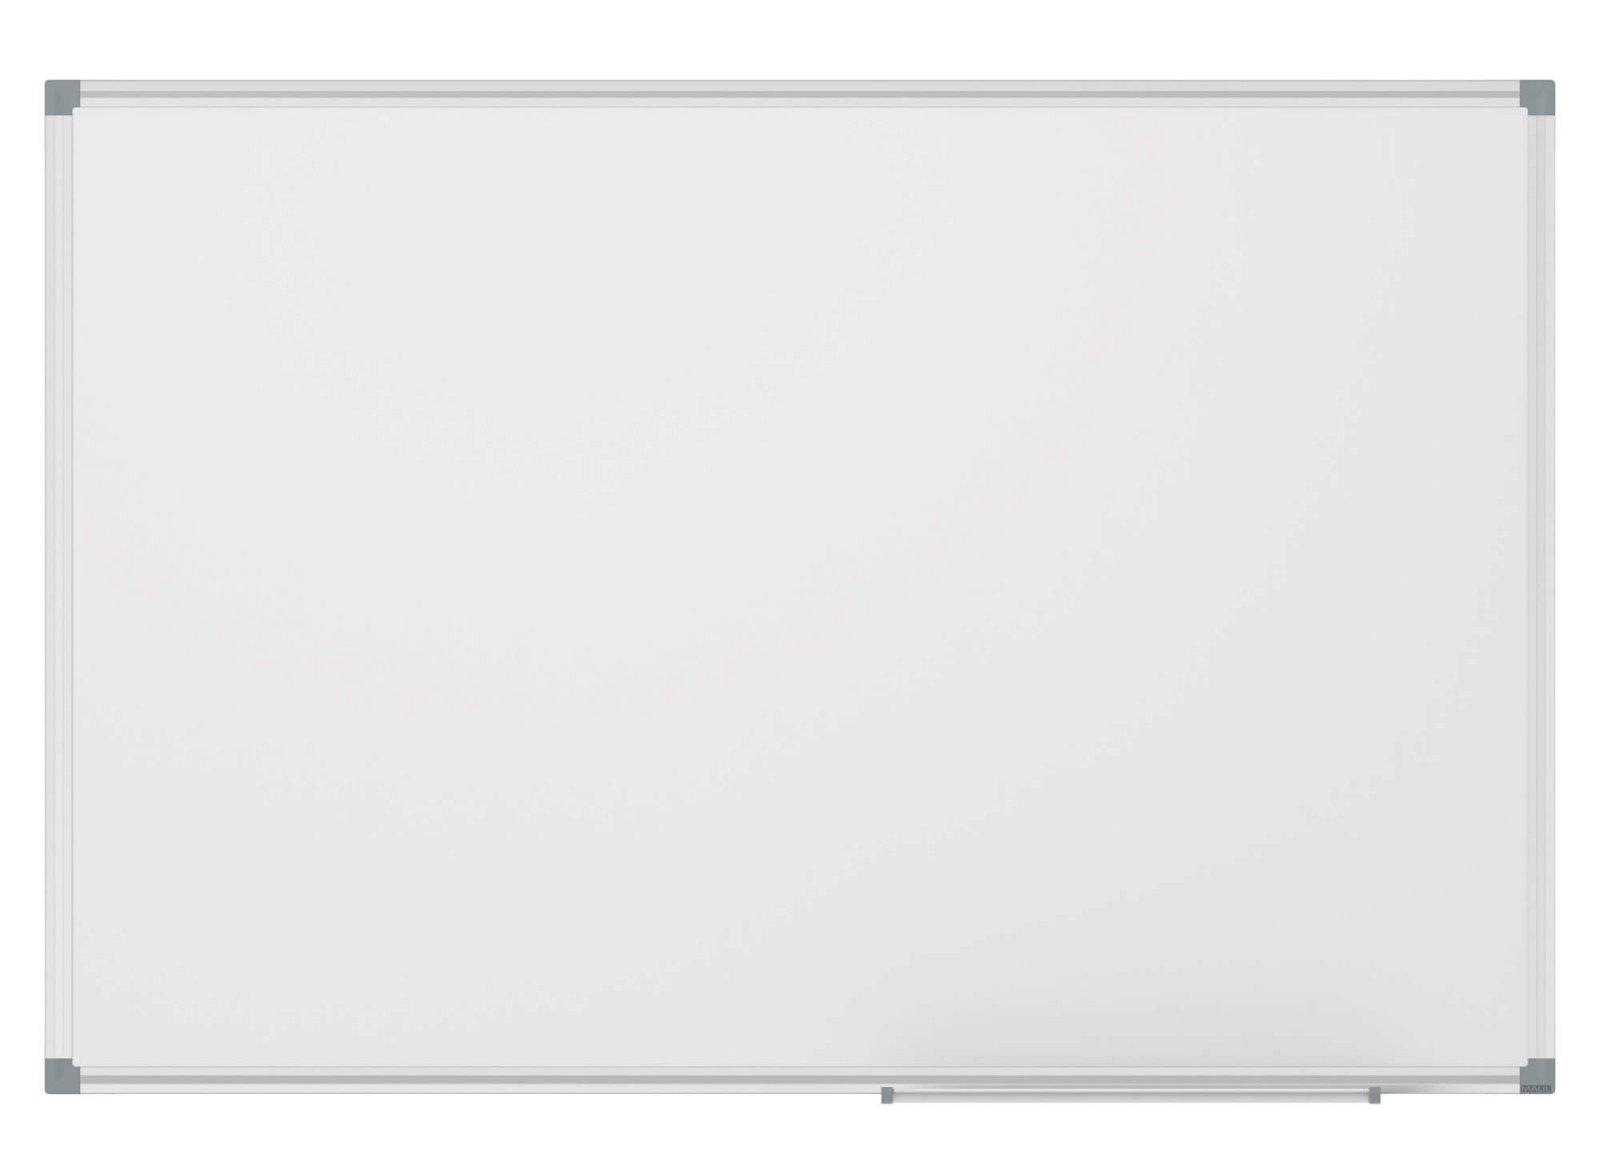 Whiteboard MAULstandard,